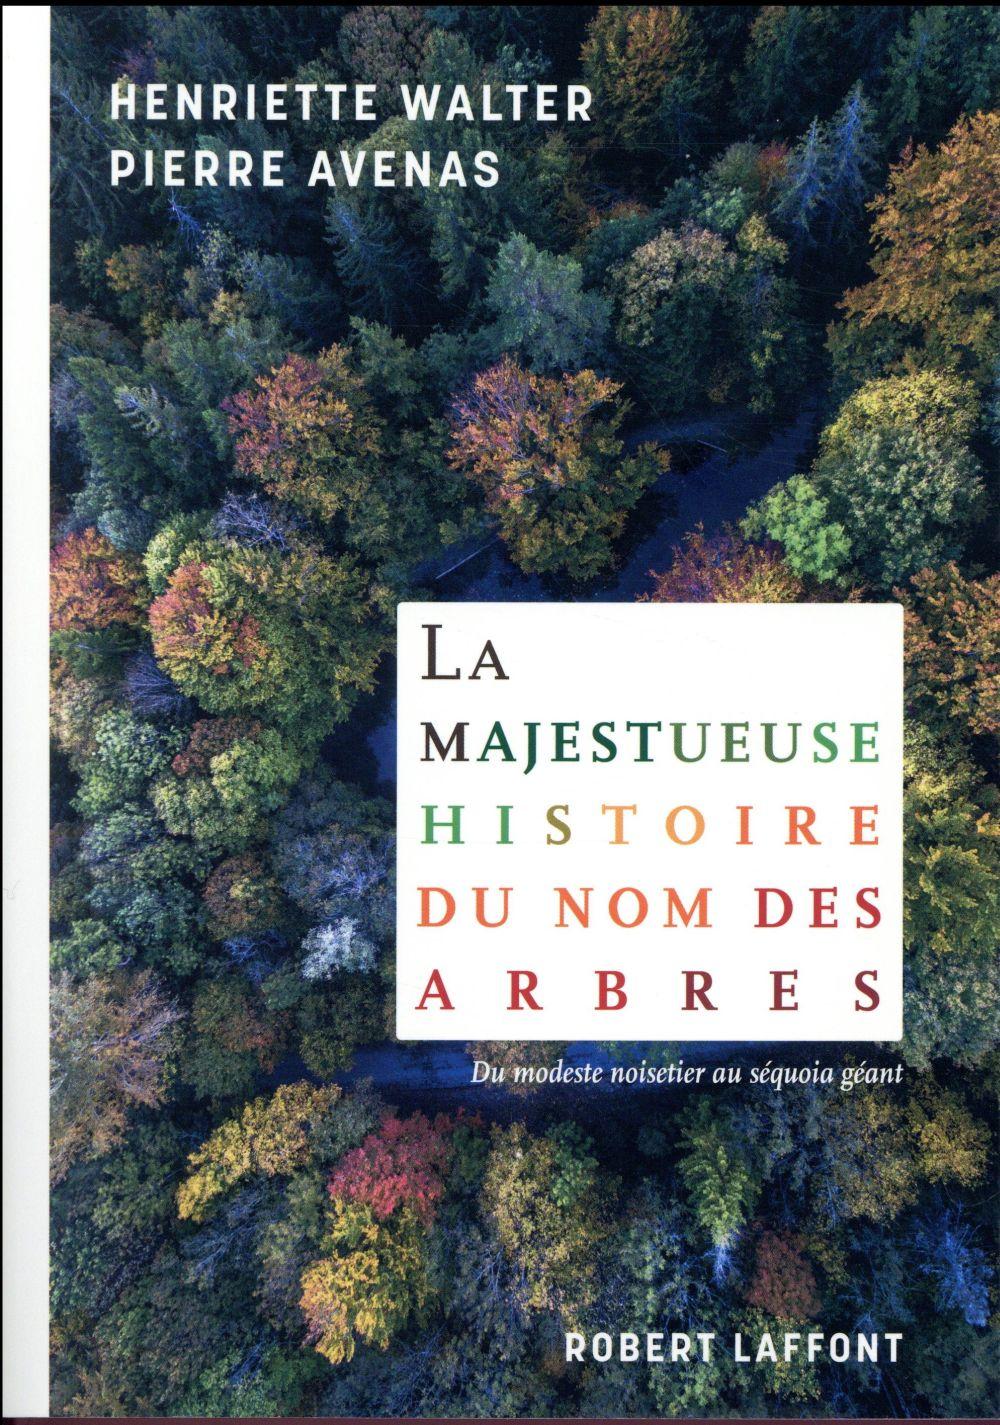 LA MAJESTUEUSE HISTOIRE DU NOM DES ARBRES WALTER/AVENAS ROBERT LAFFONT